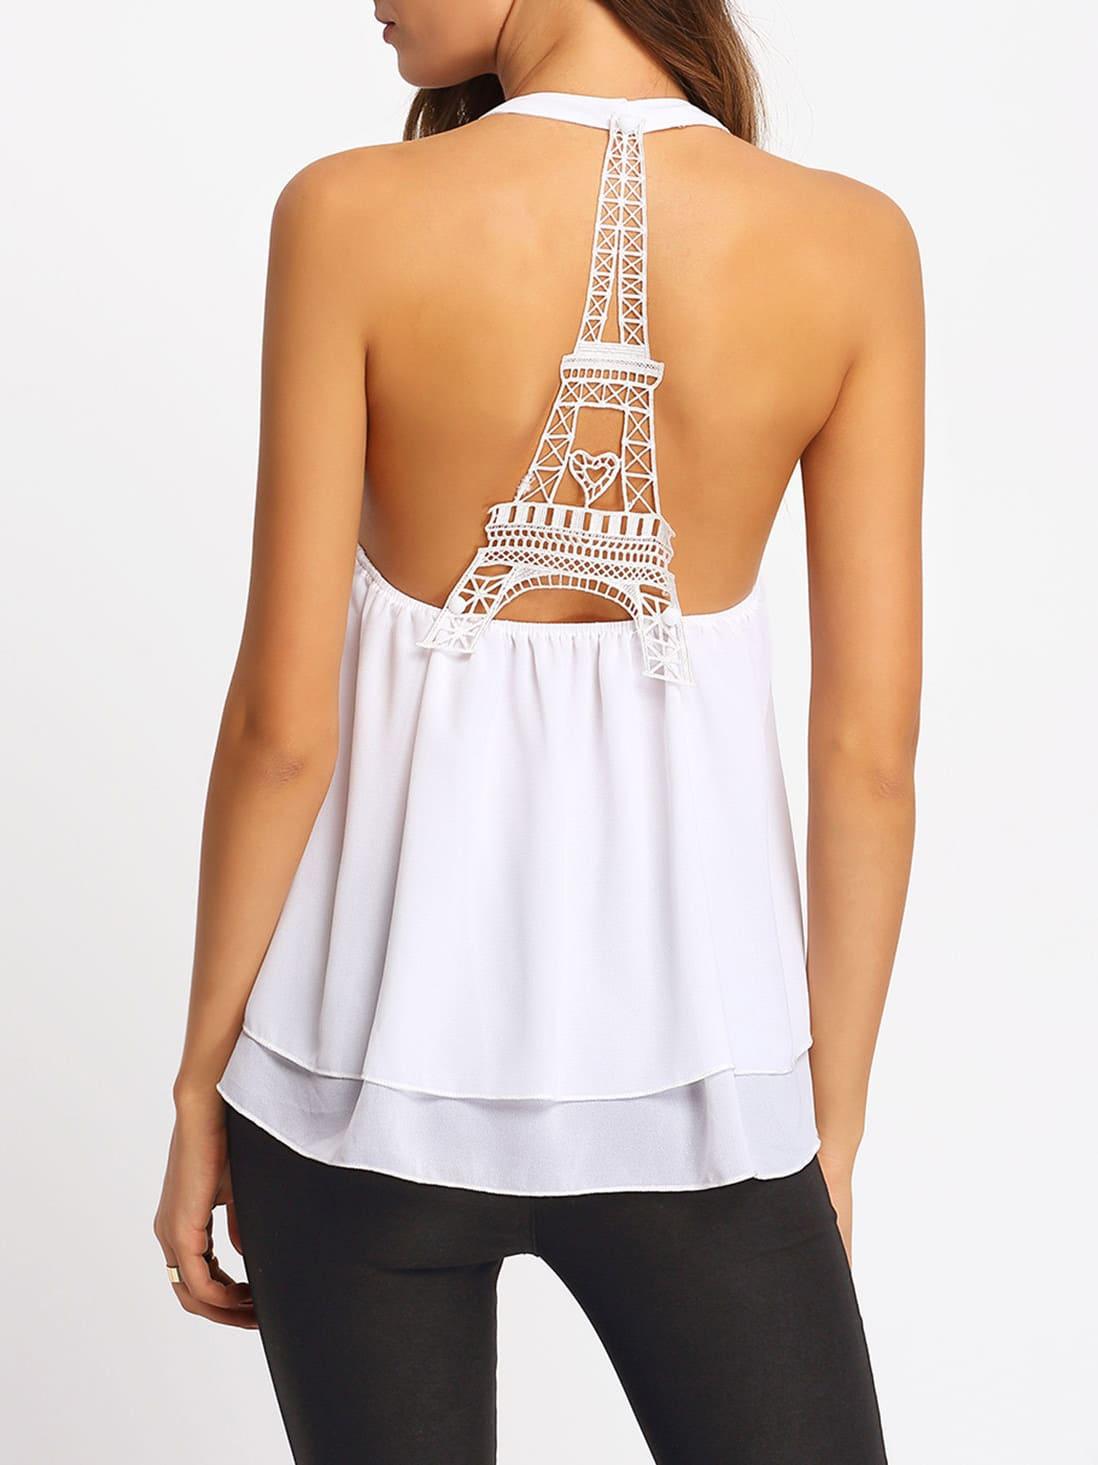 Фото White Backless Lace Chiffon Tank Top. Купить с доставкой